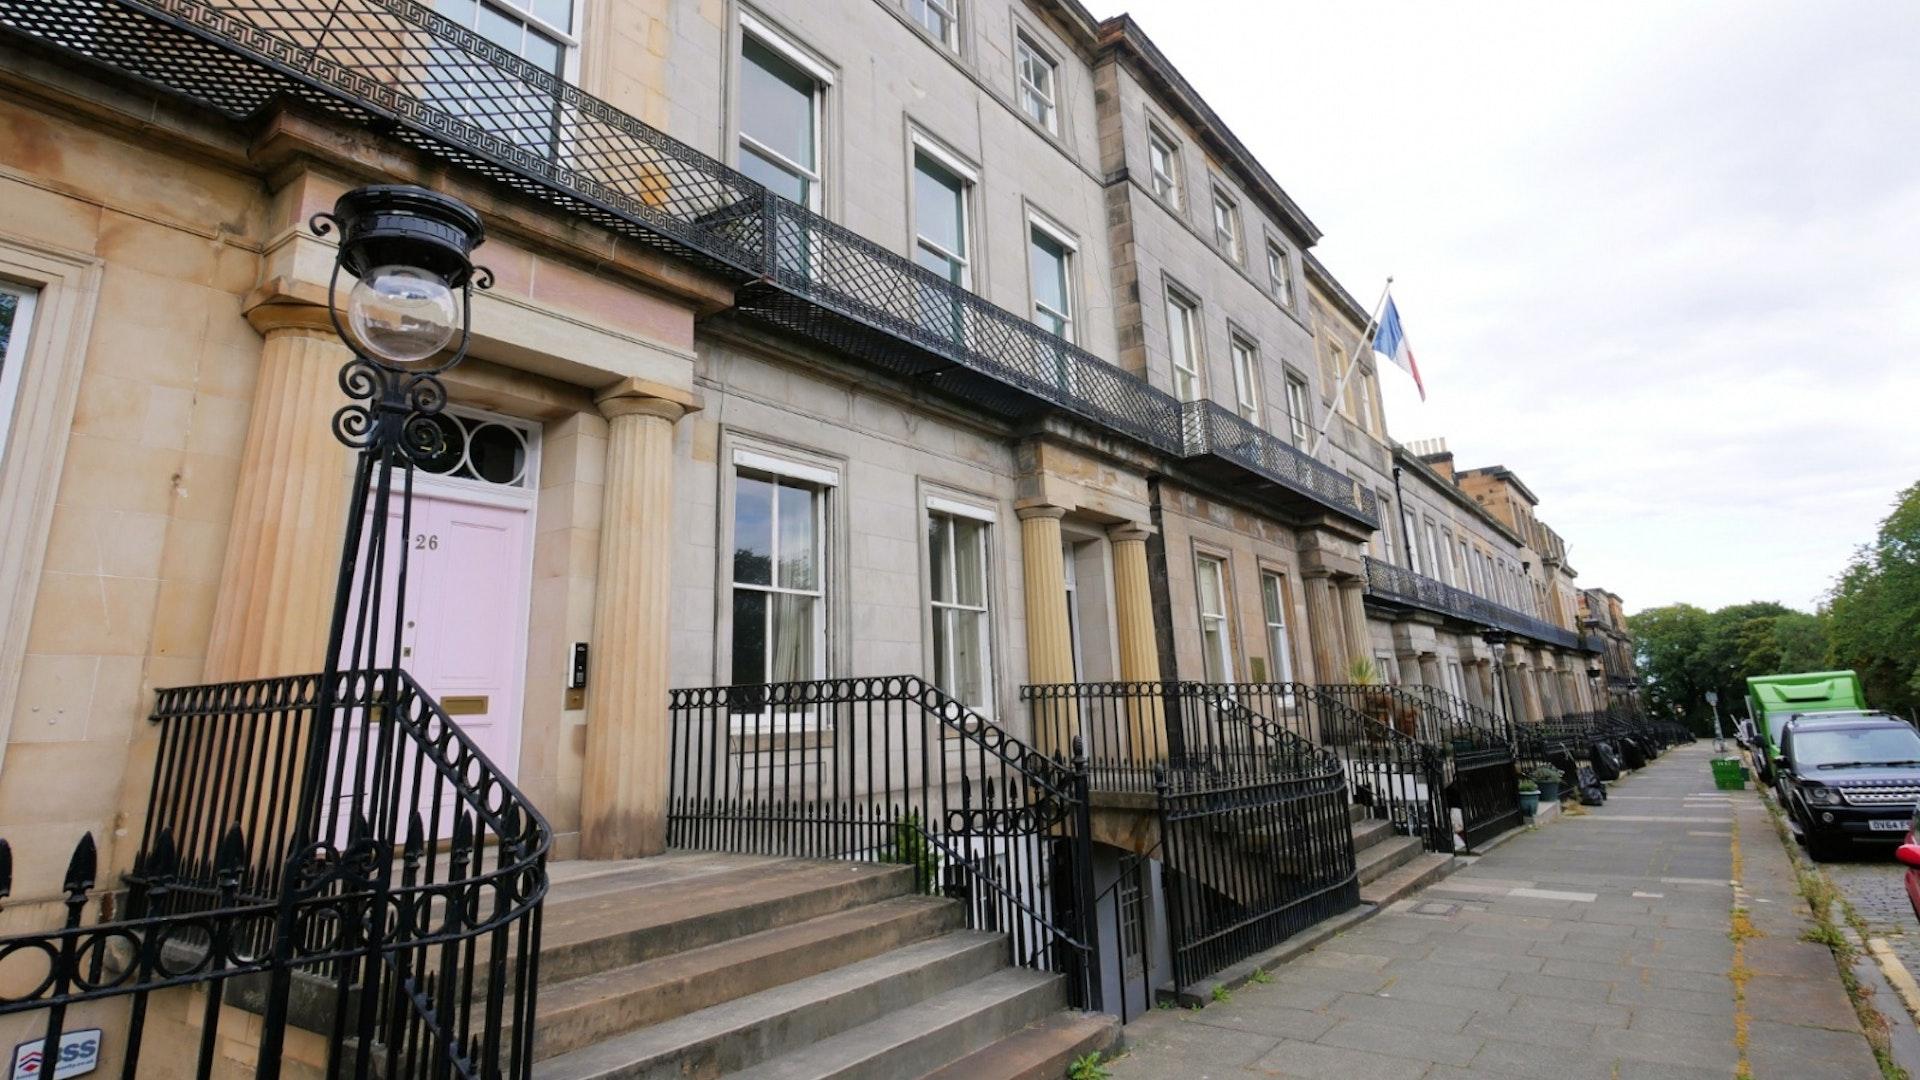 P317: Regent Terrace, Calton Hill, Edinburgh